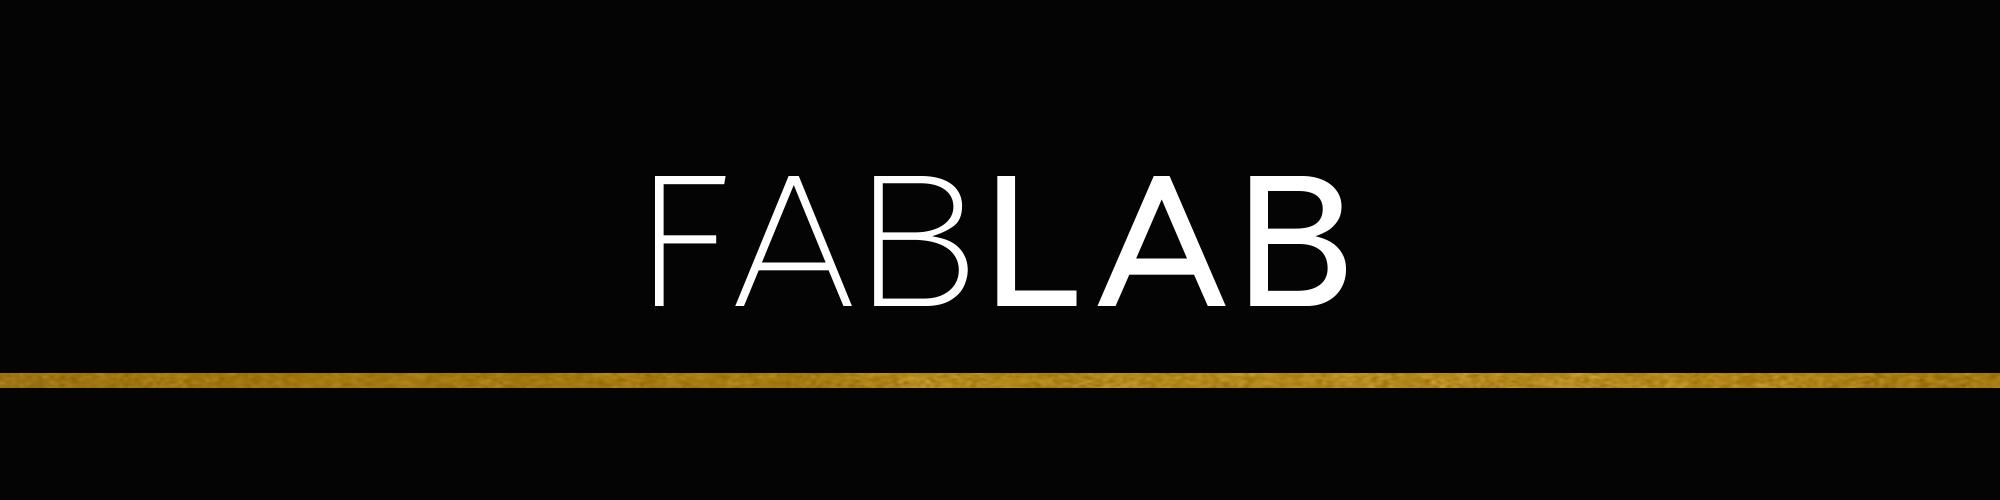 FabLab Banner.jpg